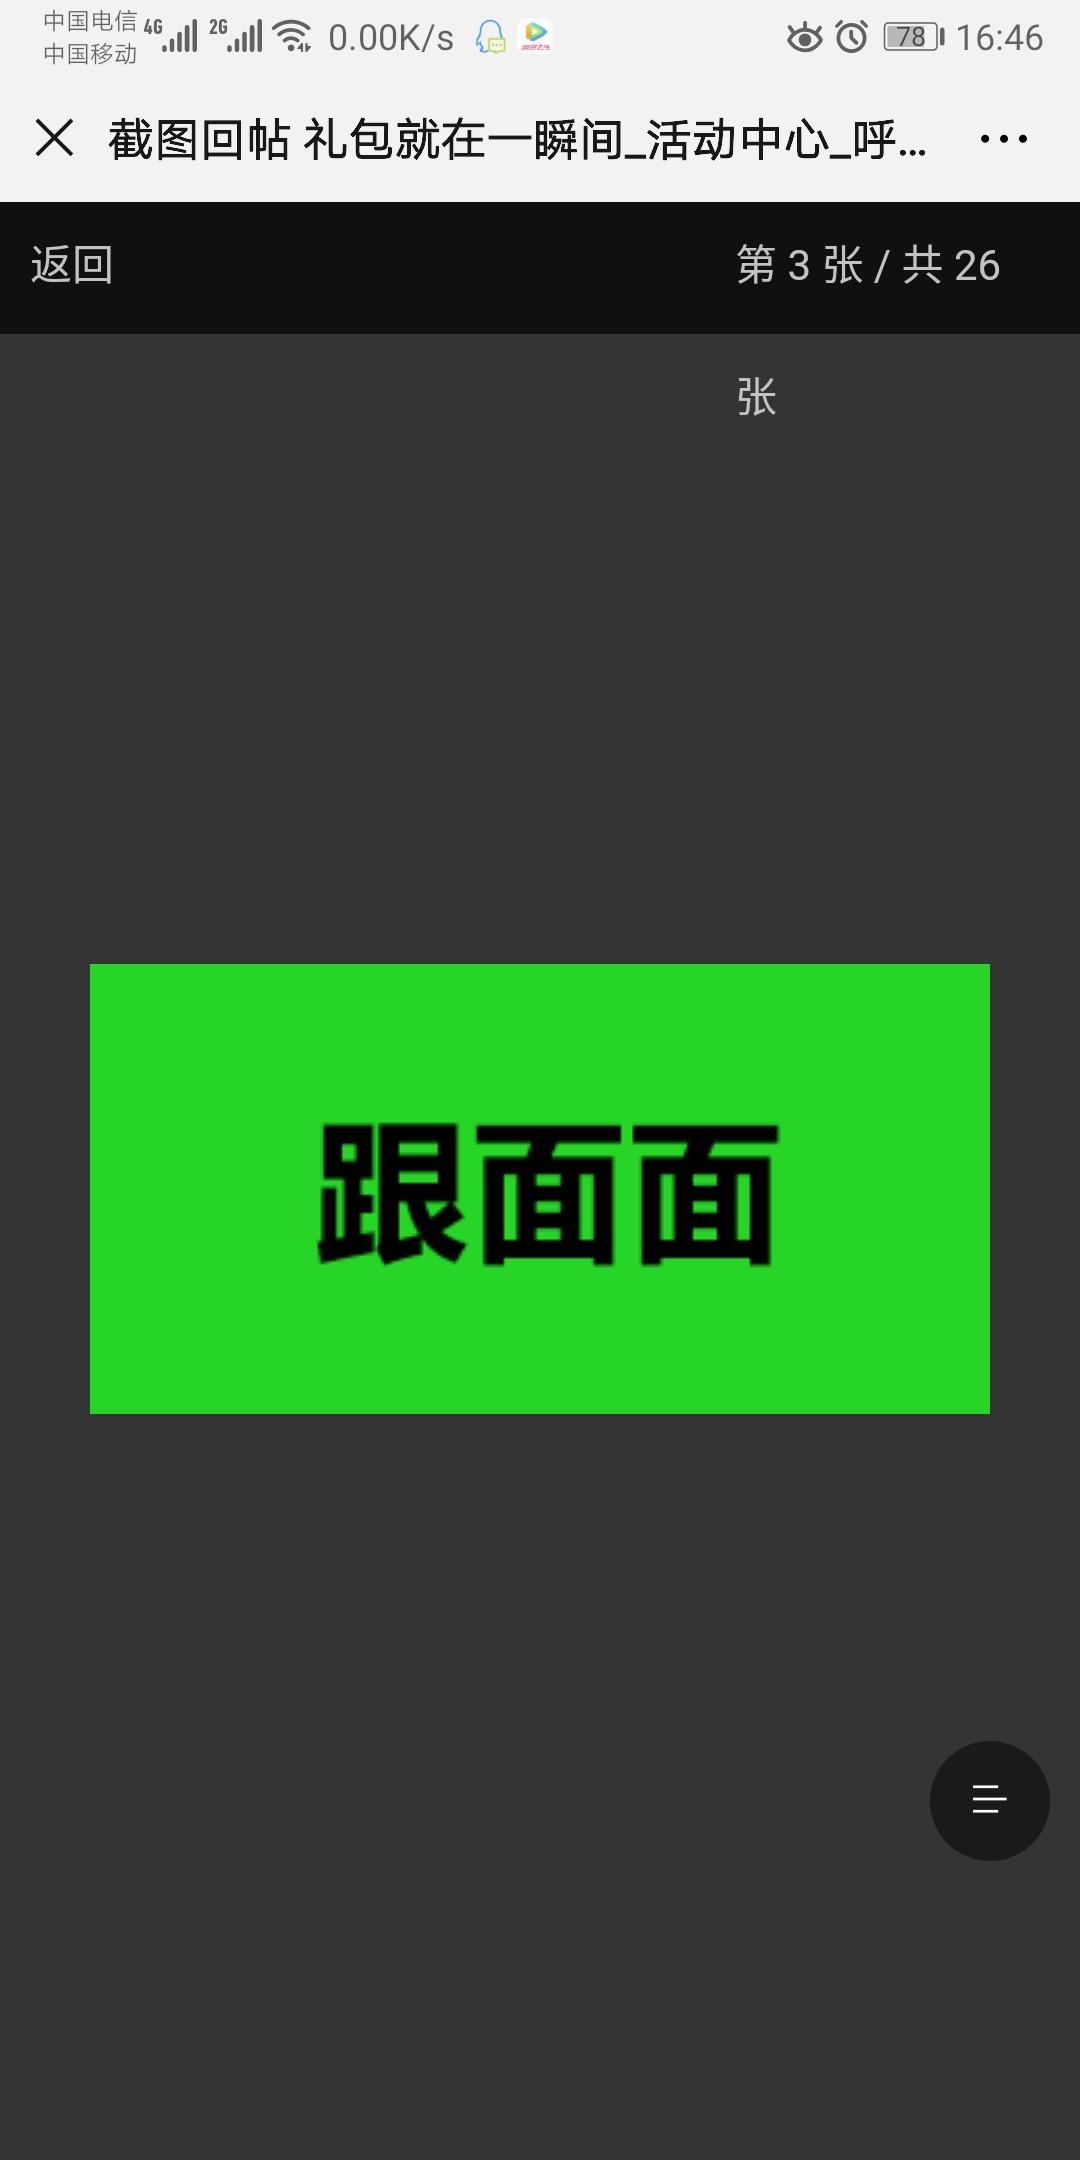 Screenshot_20190725_164615_com.tencent.mm.jpg